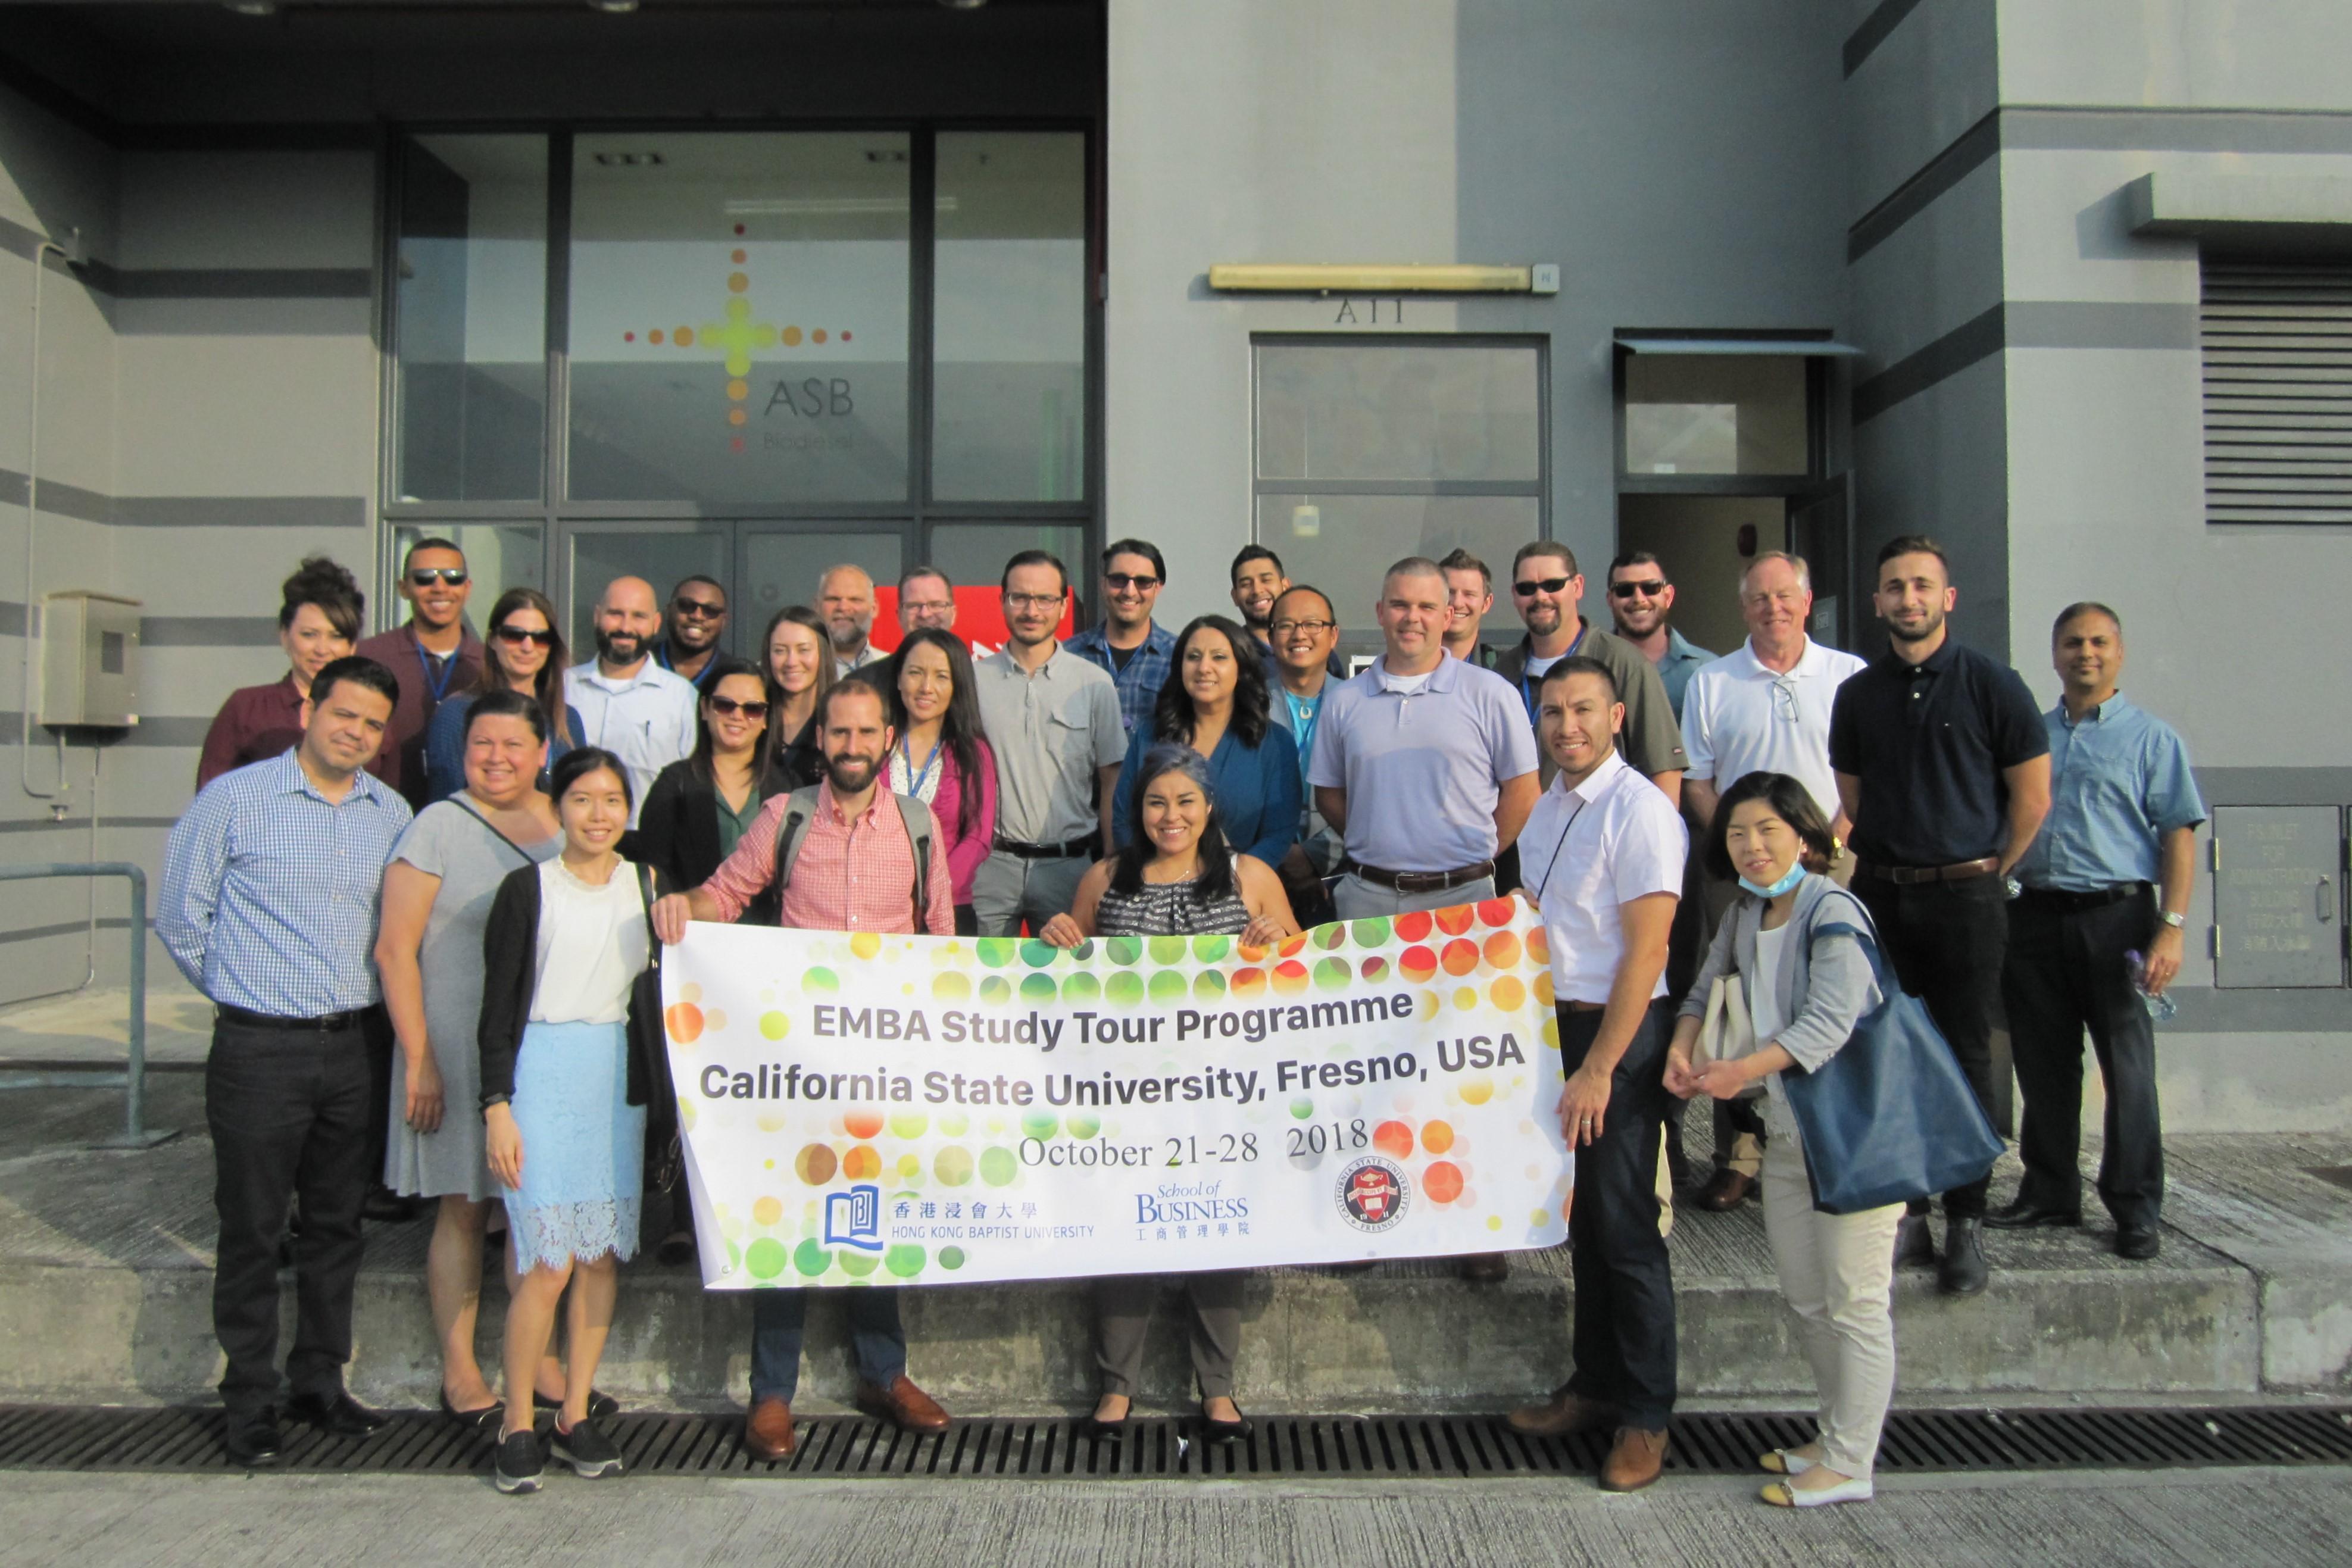 ASB_Biodiesel_Plant_HKBU_visit